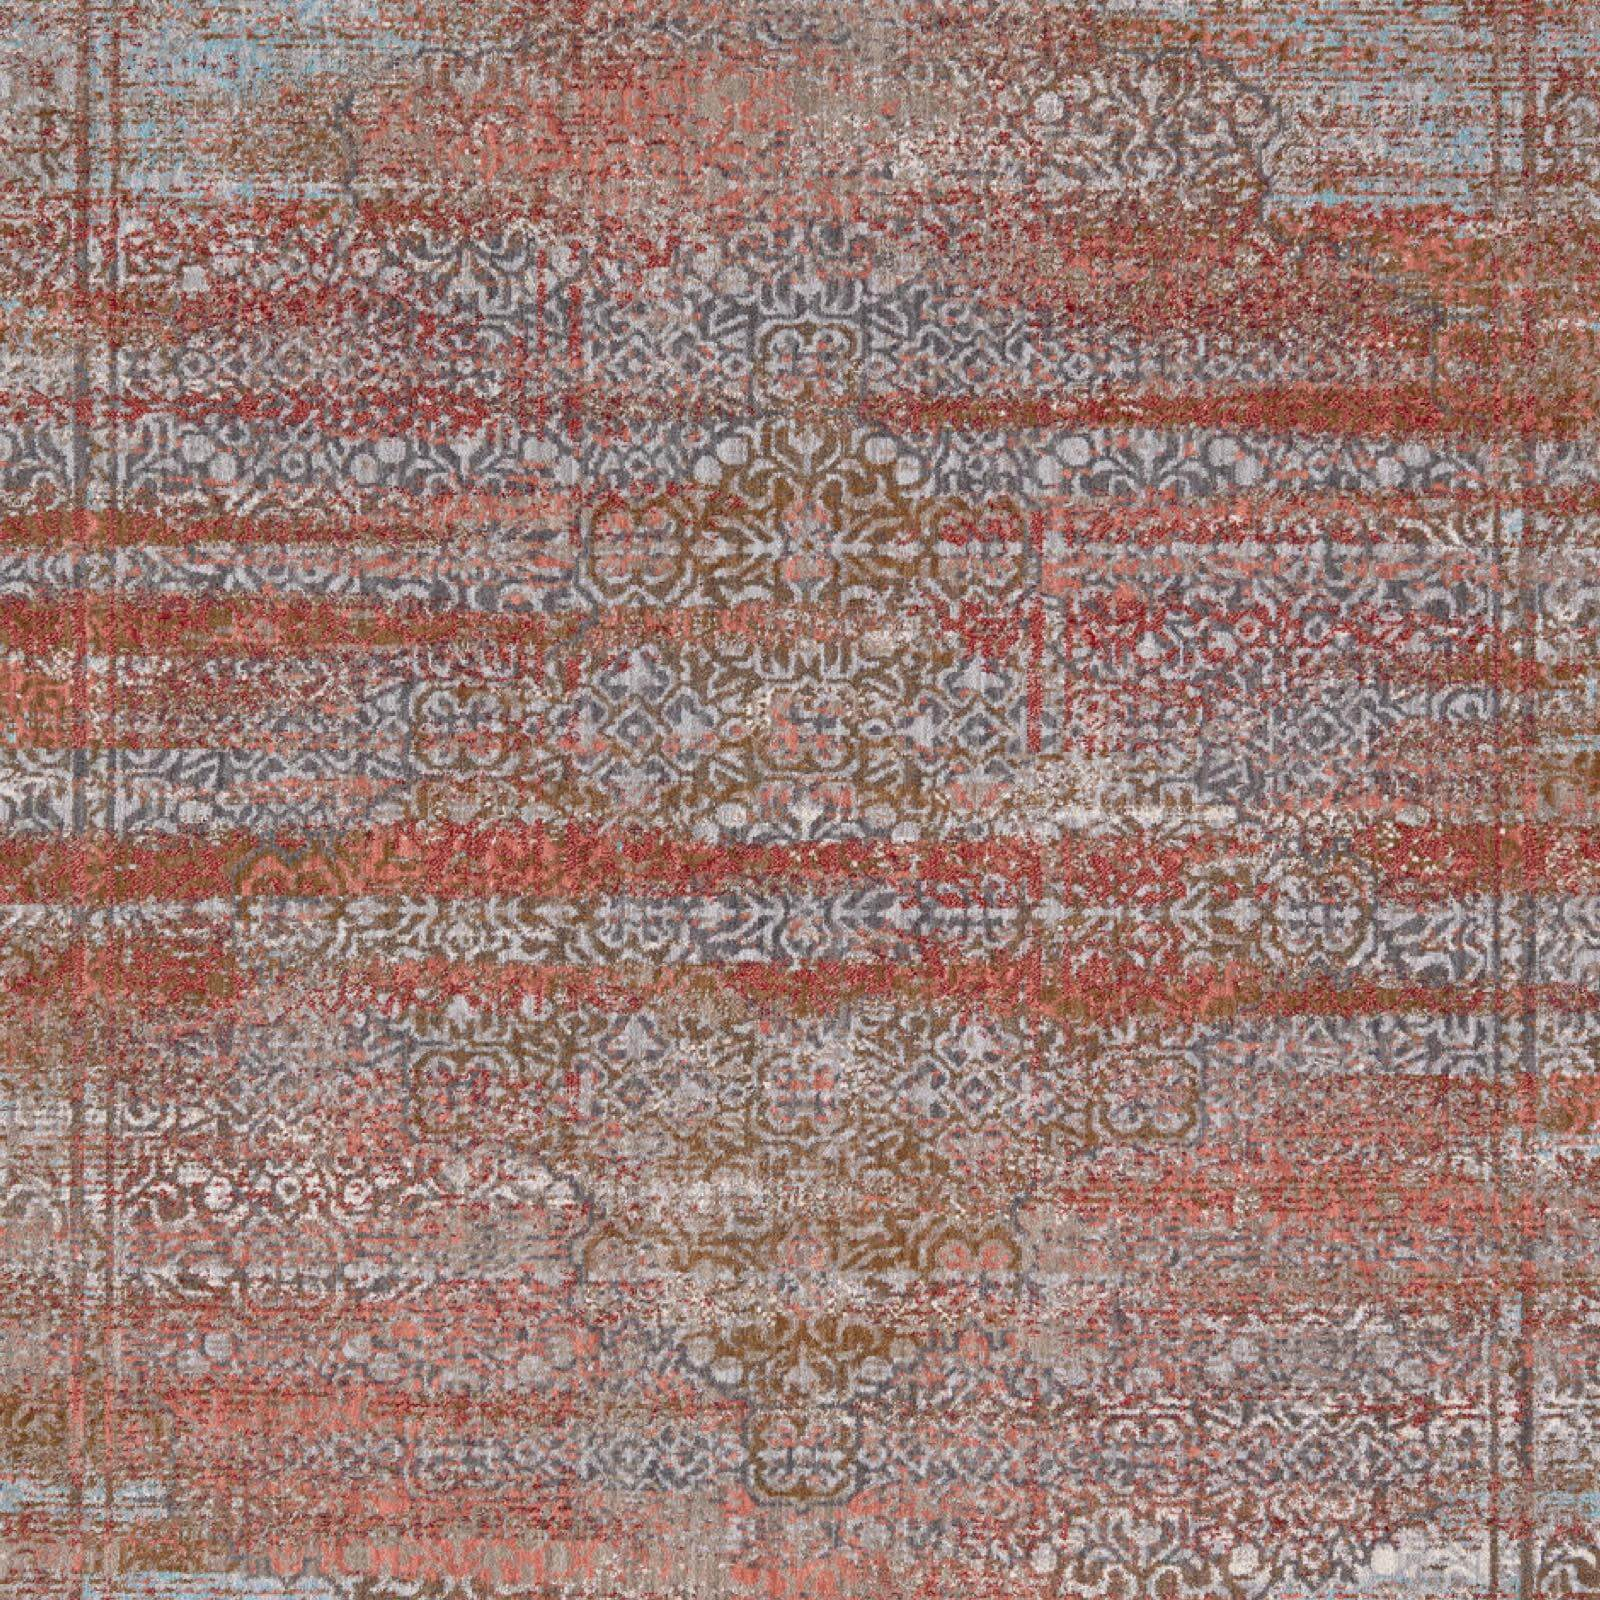 Area Rug | Haley's Flooring & Interiors